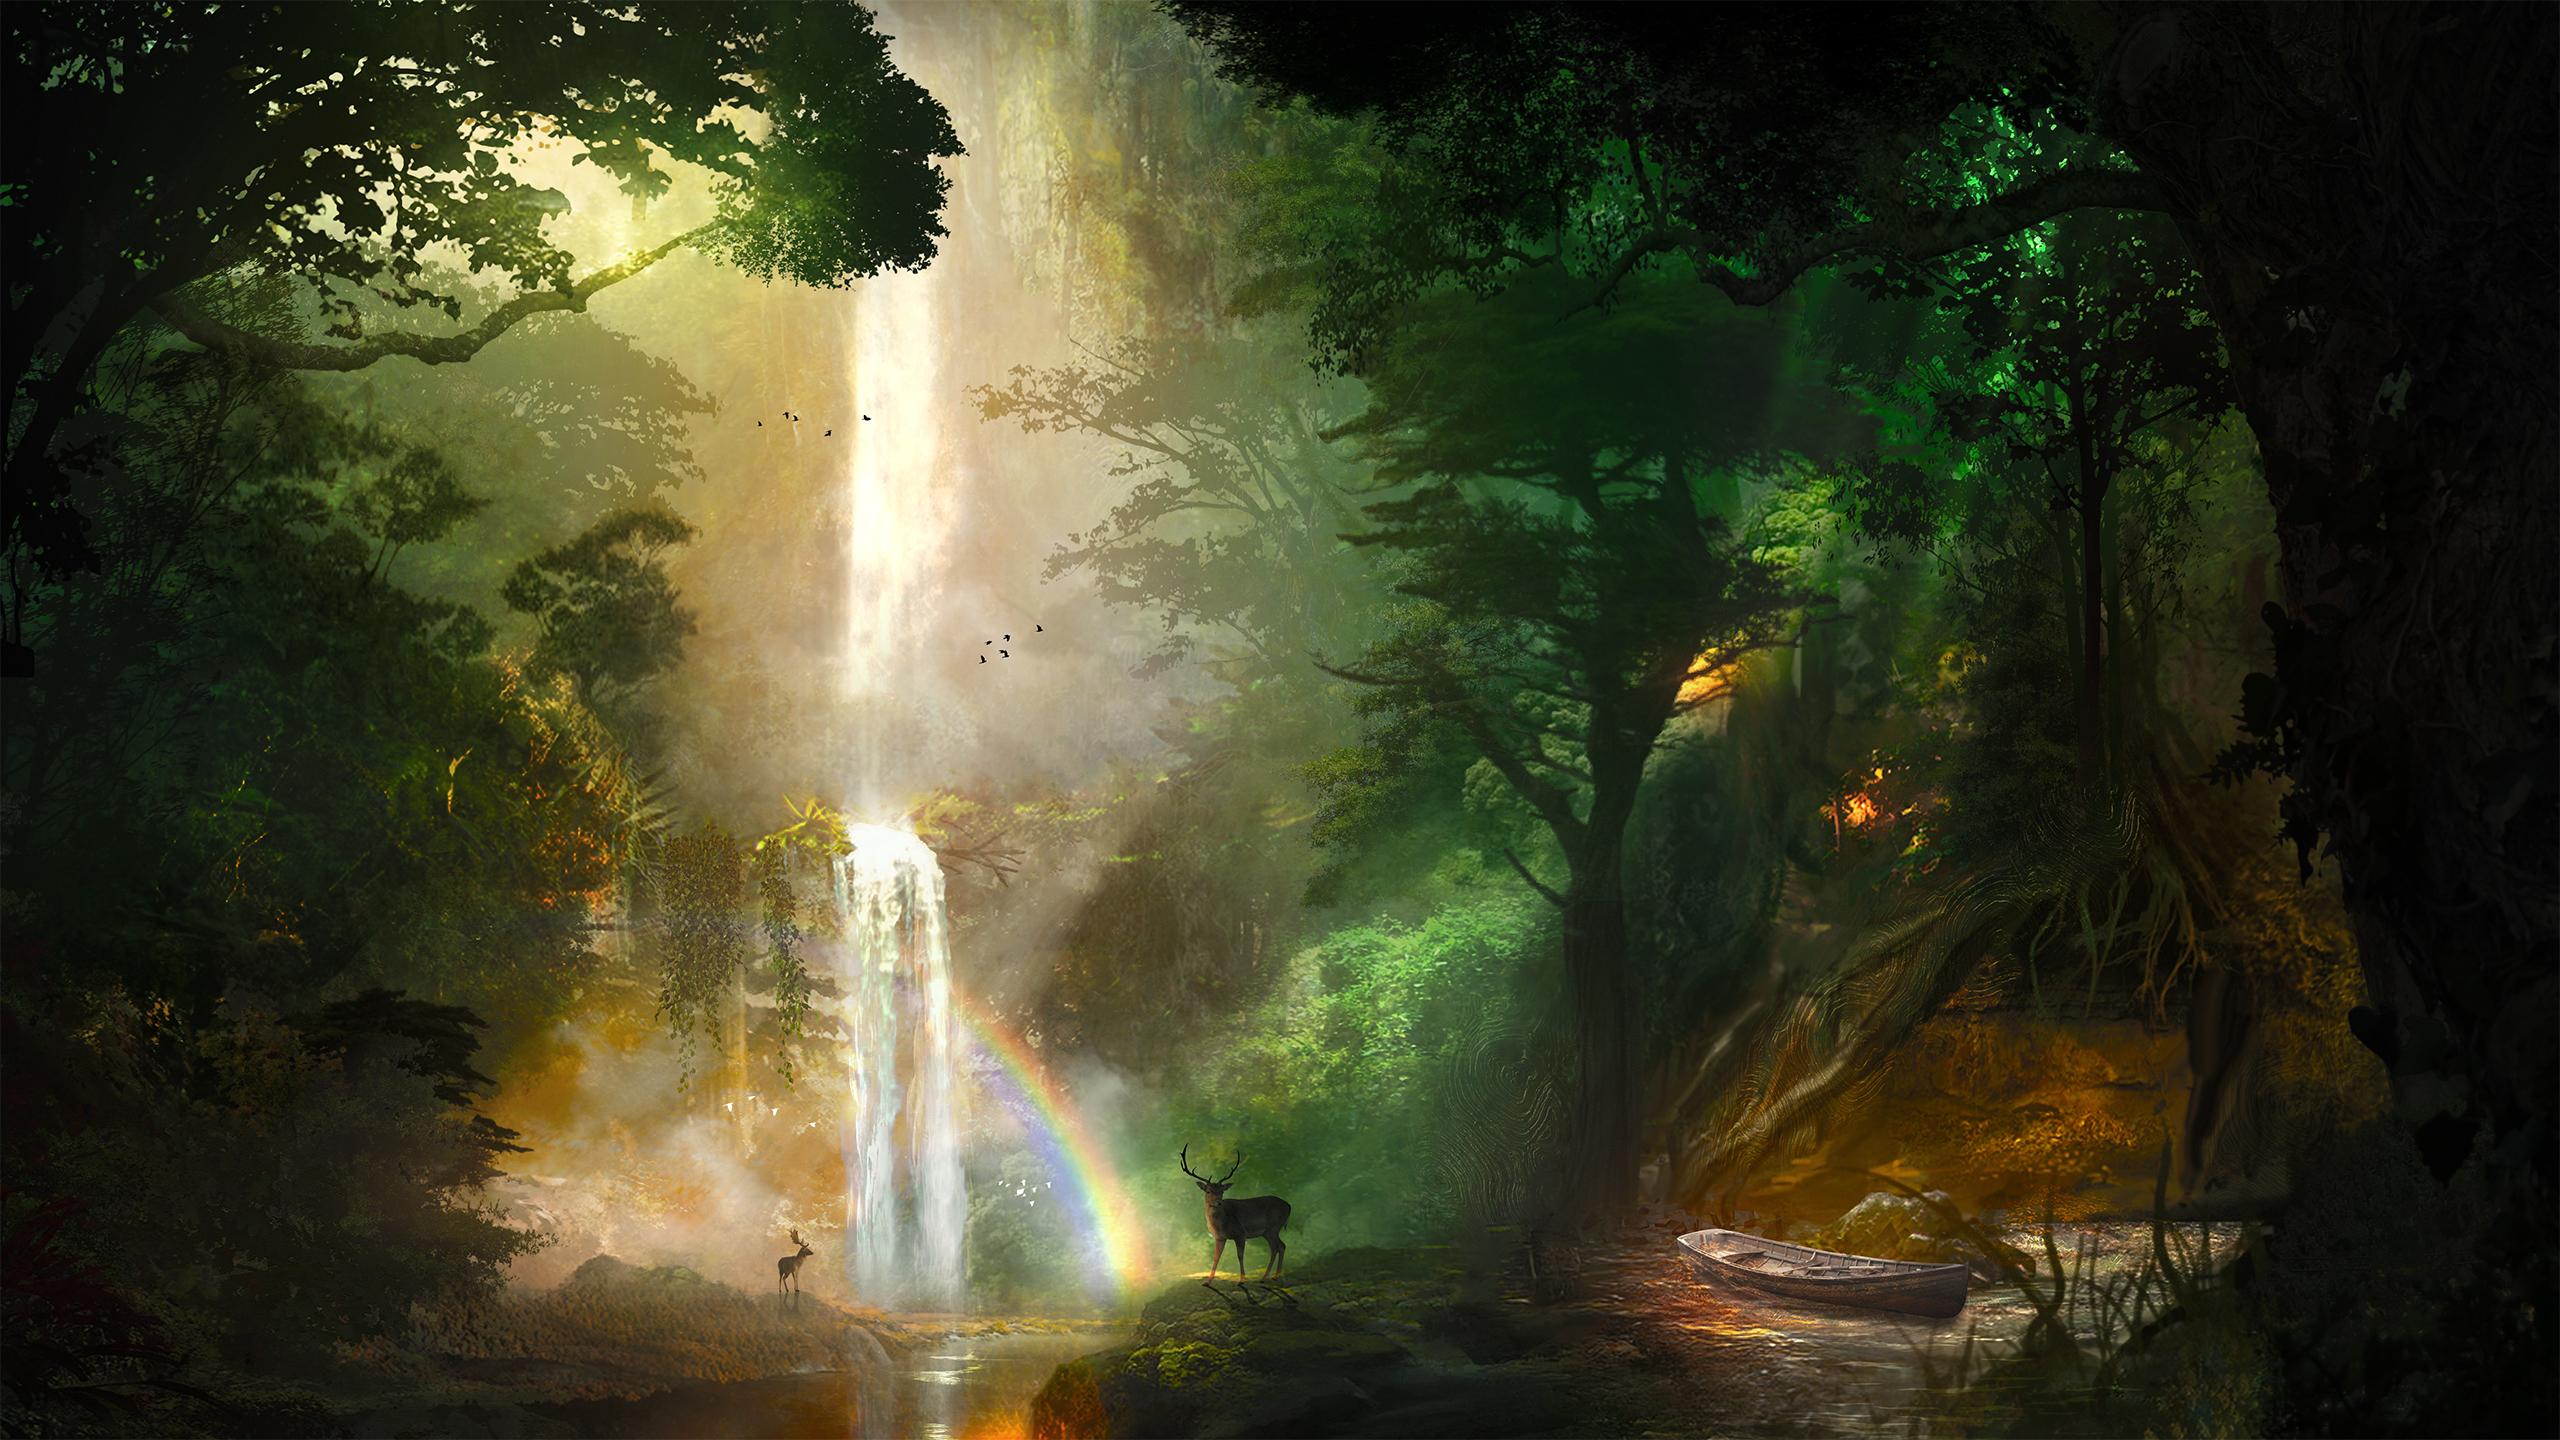 jungle | Explore jungle on DeviantArt